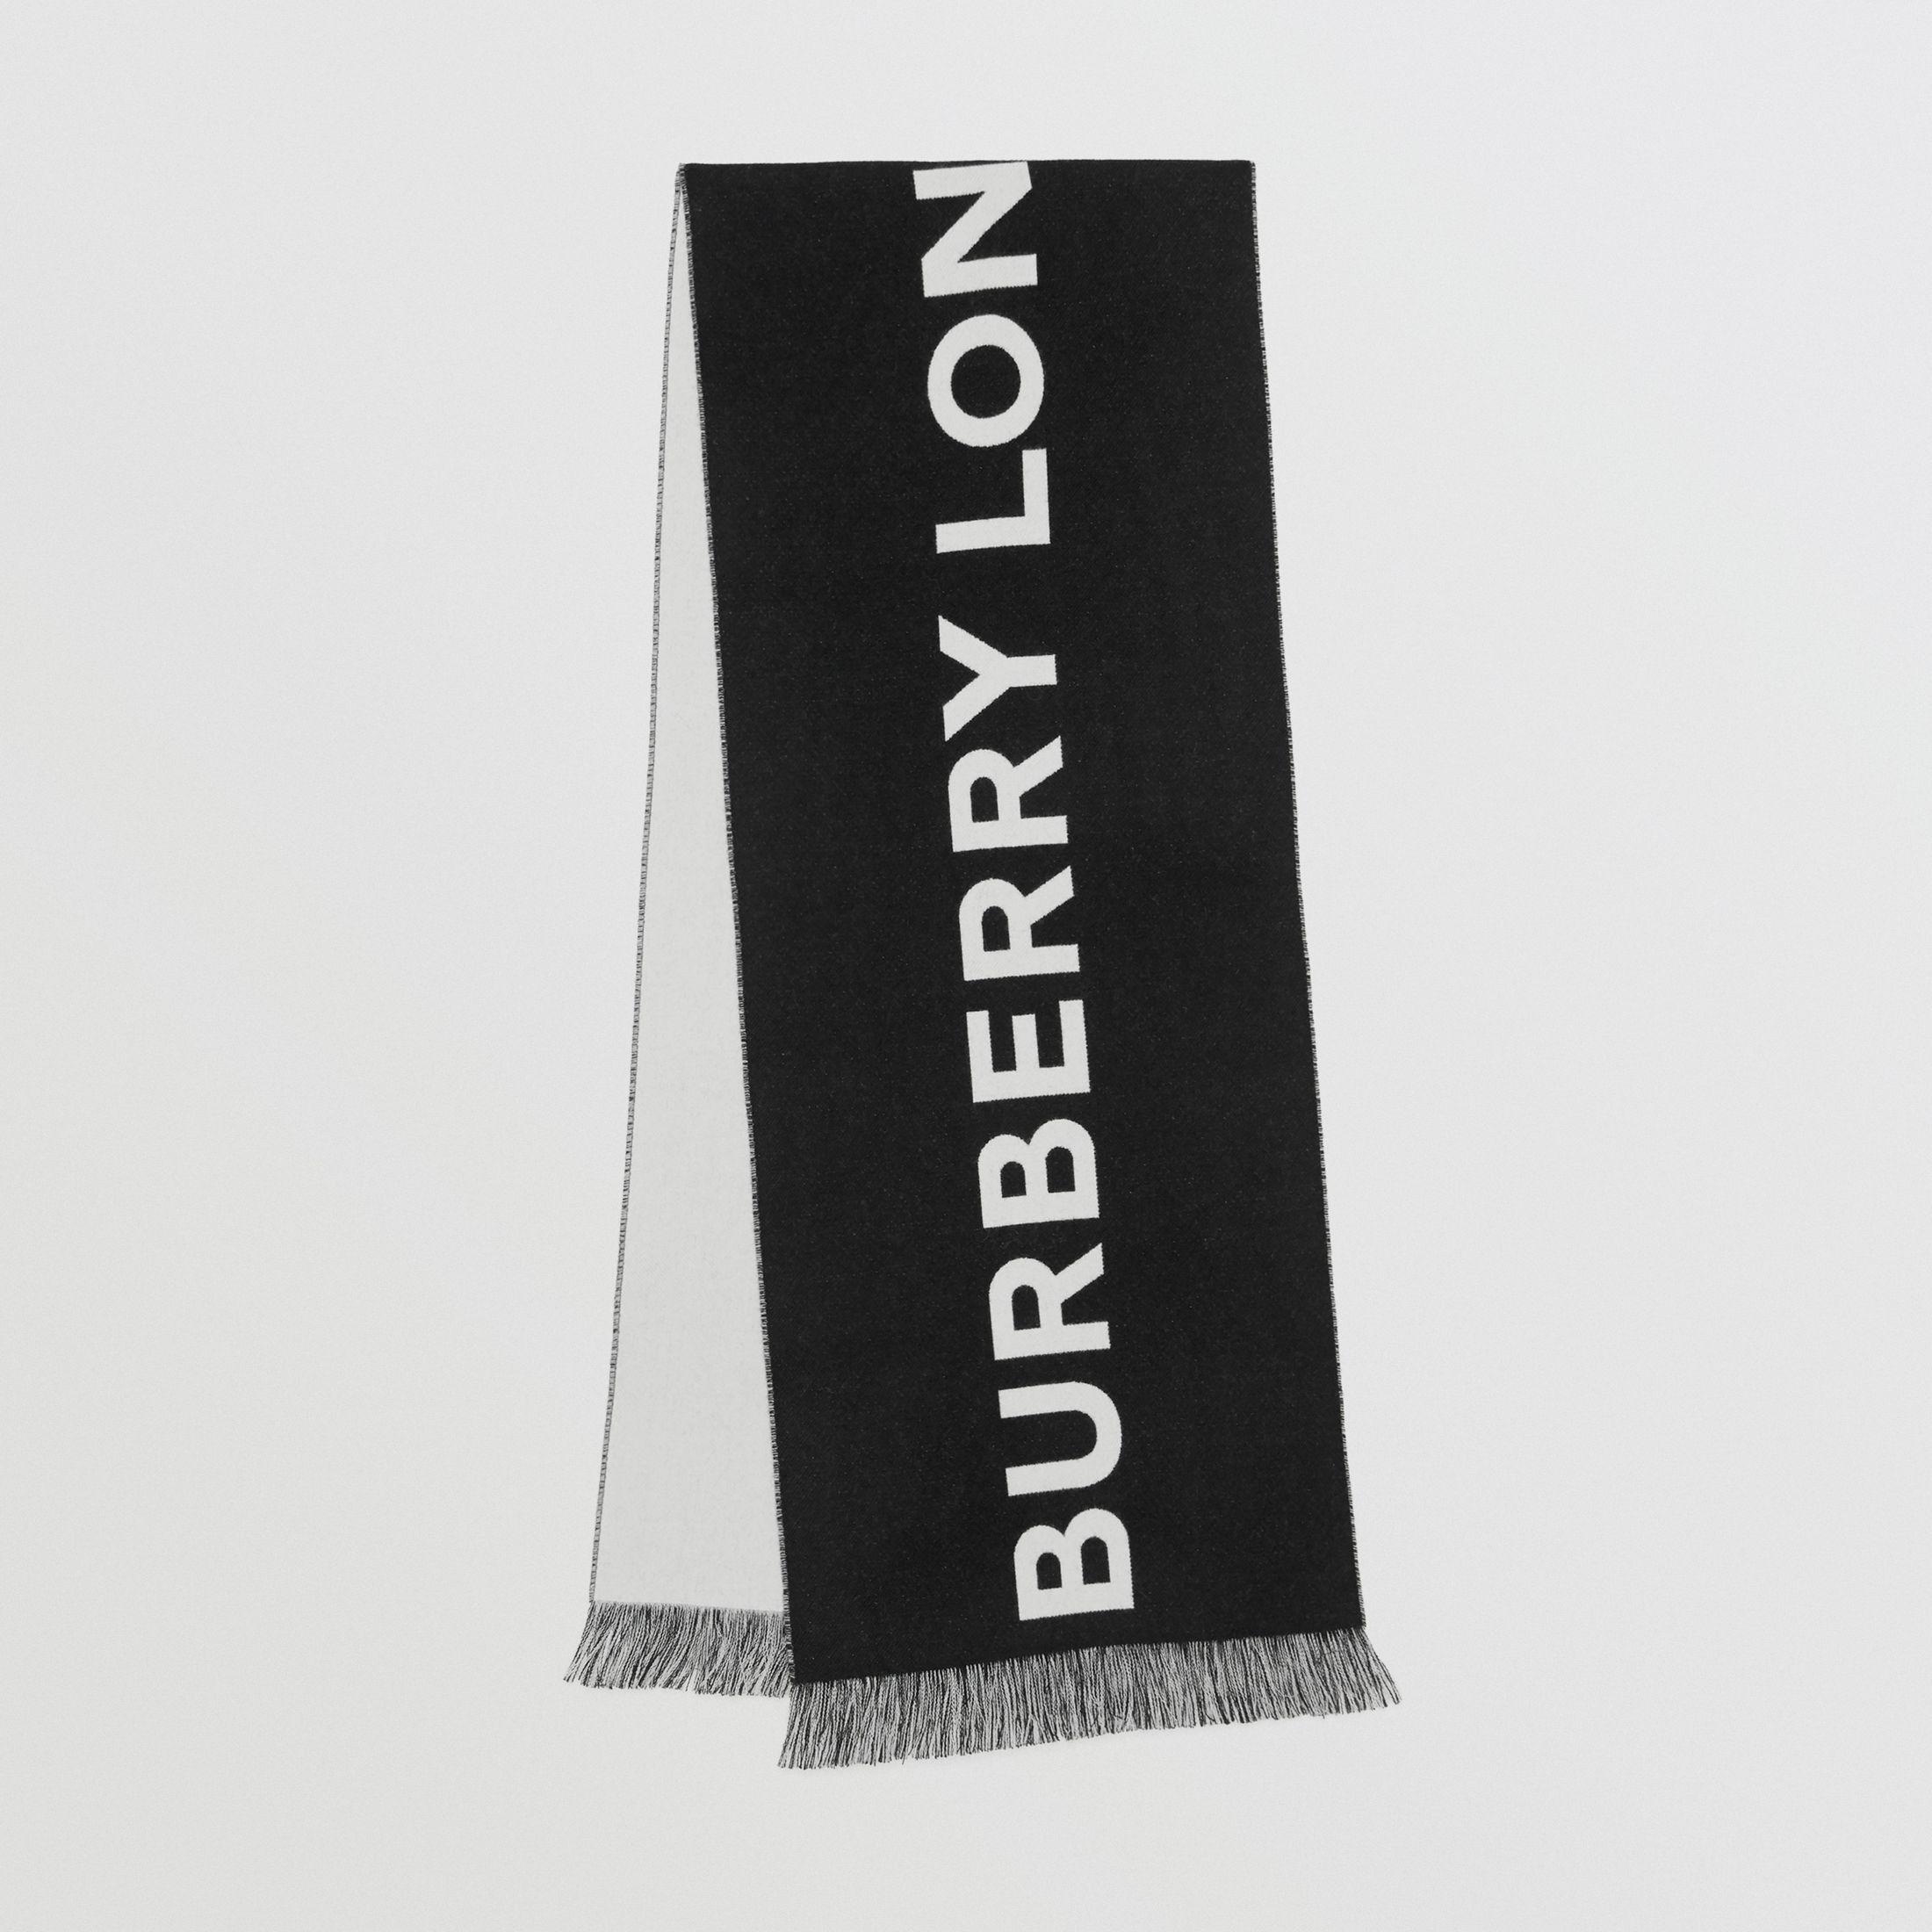 Burberry Ricardo Tisci for Burberry black & white logo